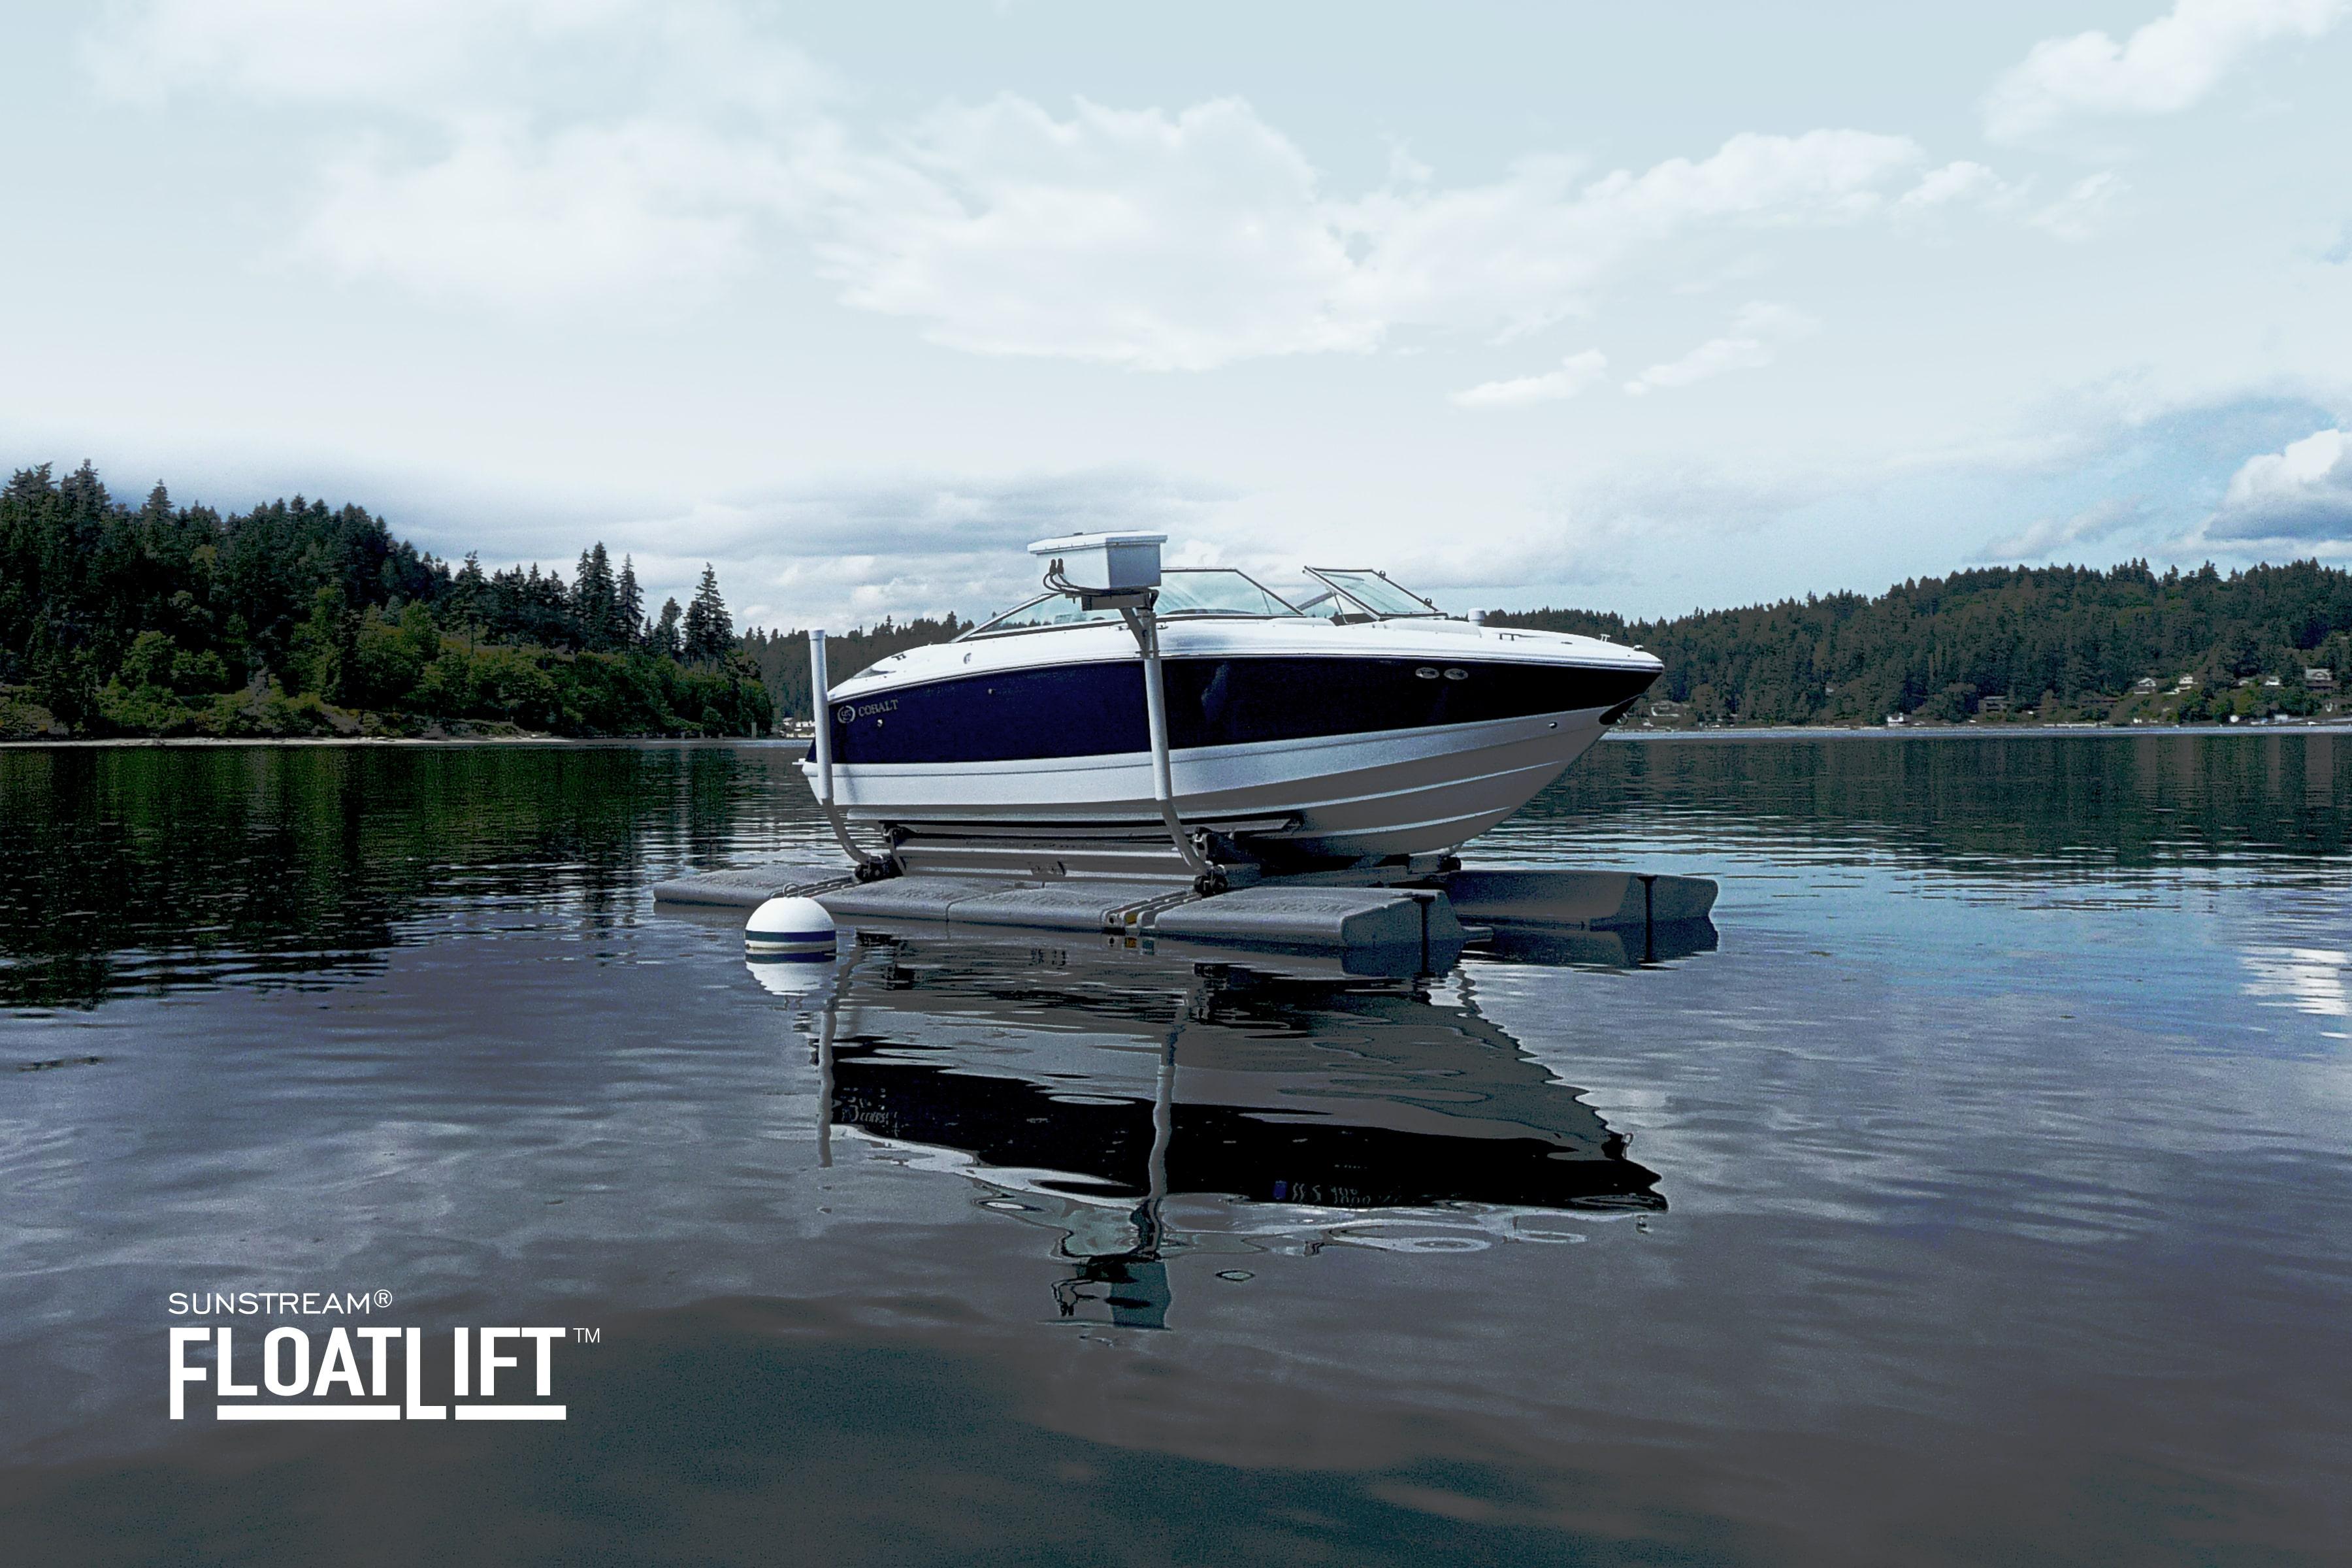 Sunstream Floatlift Example hydraulic boat lift